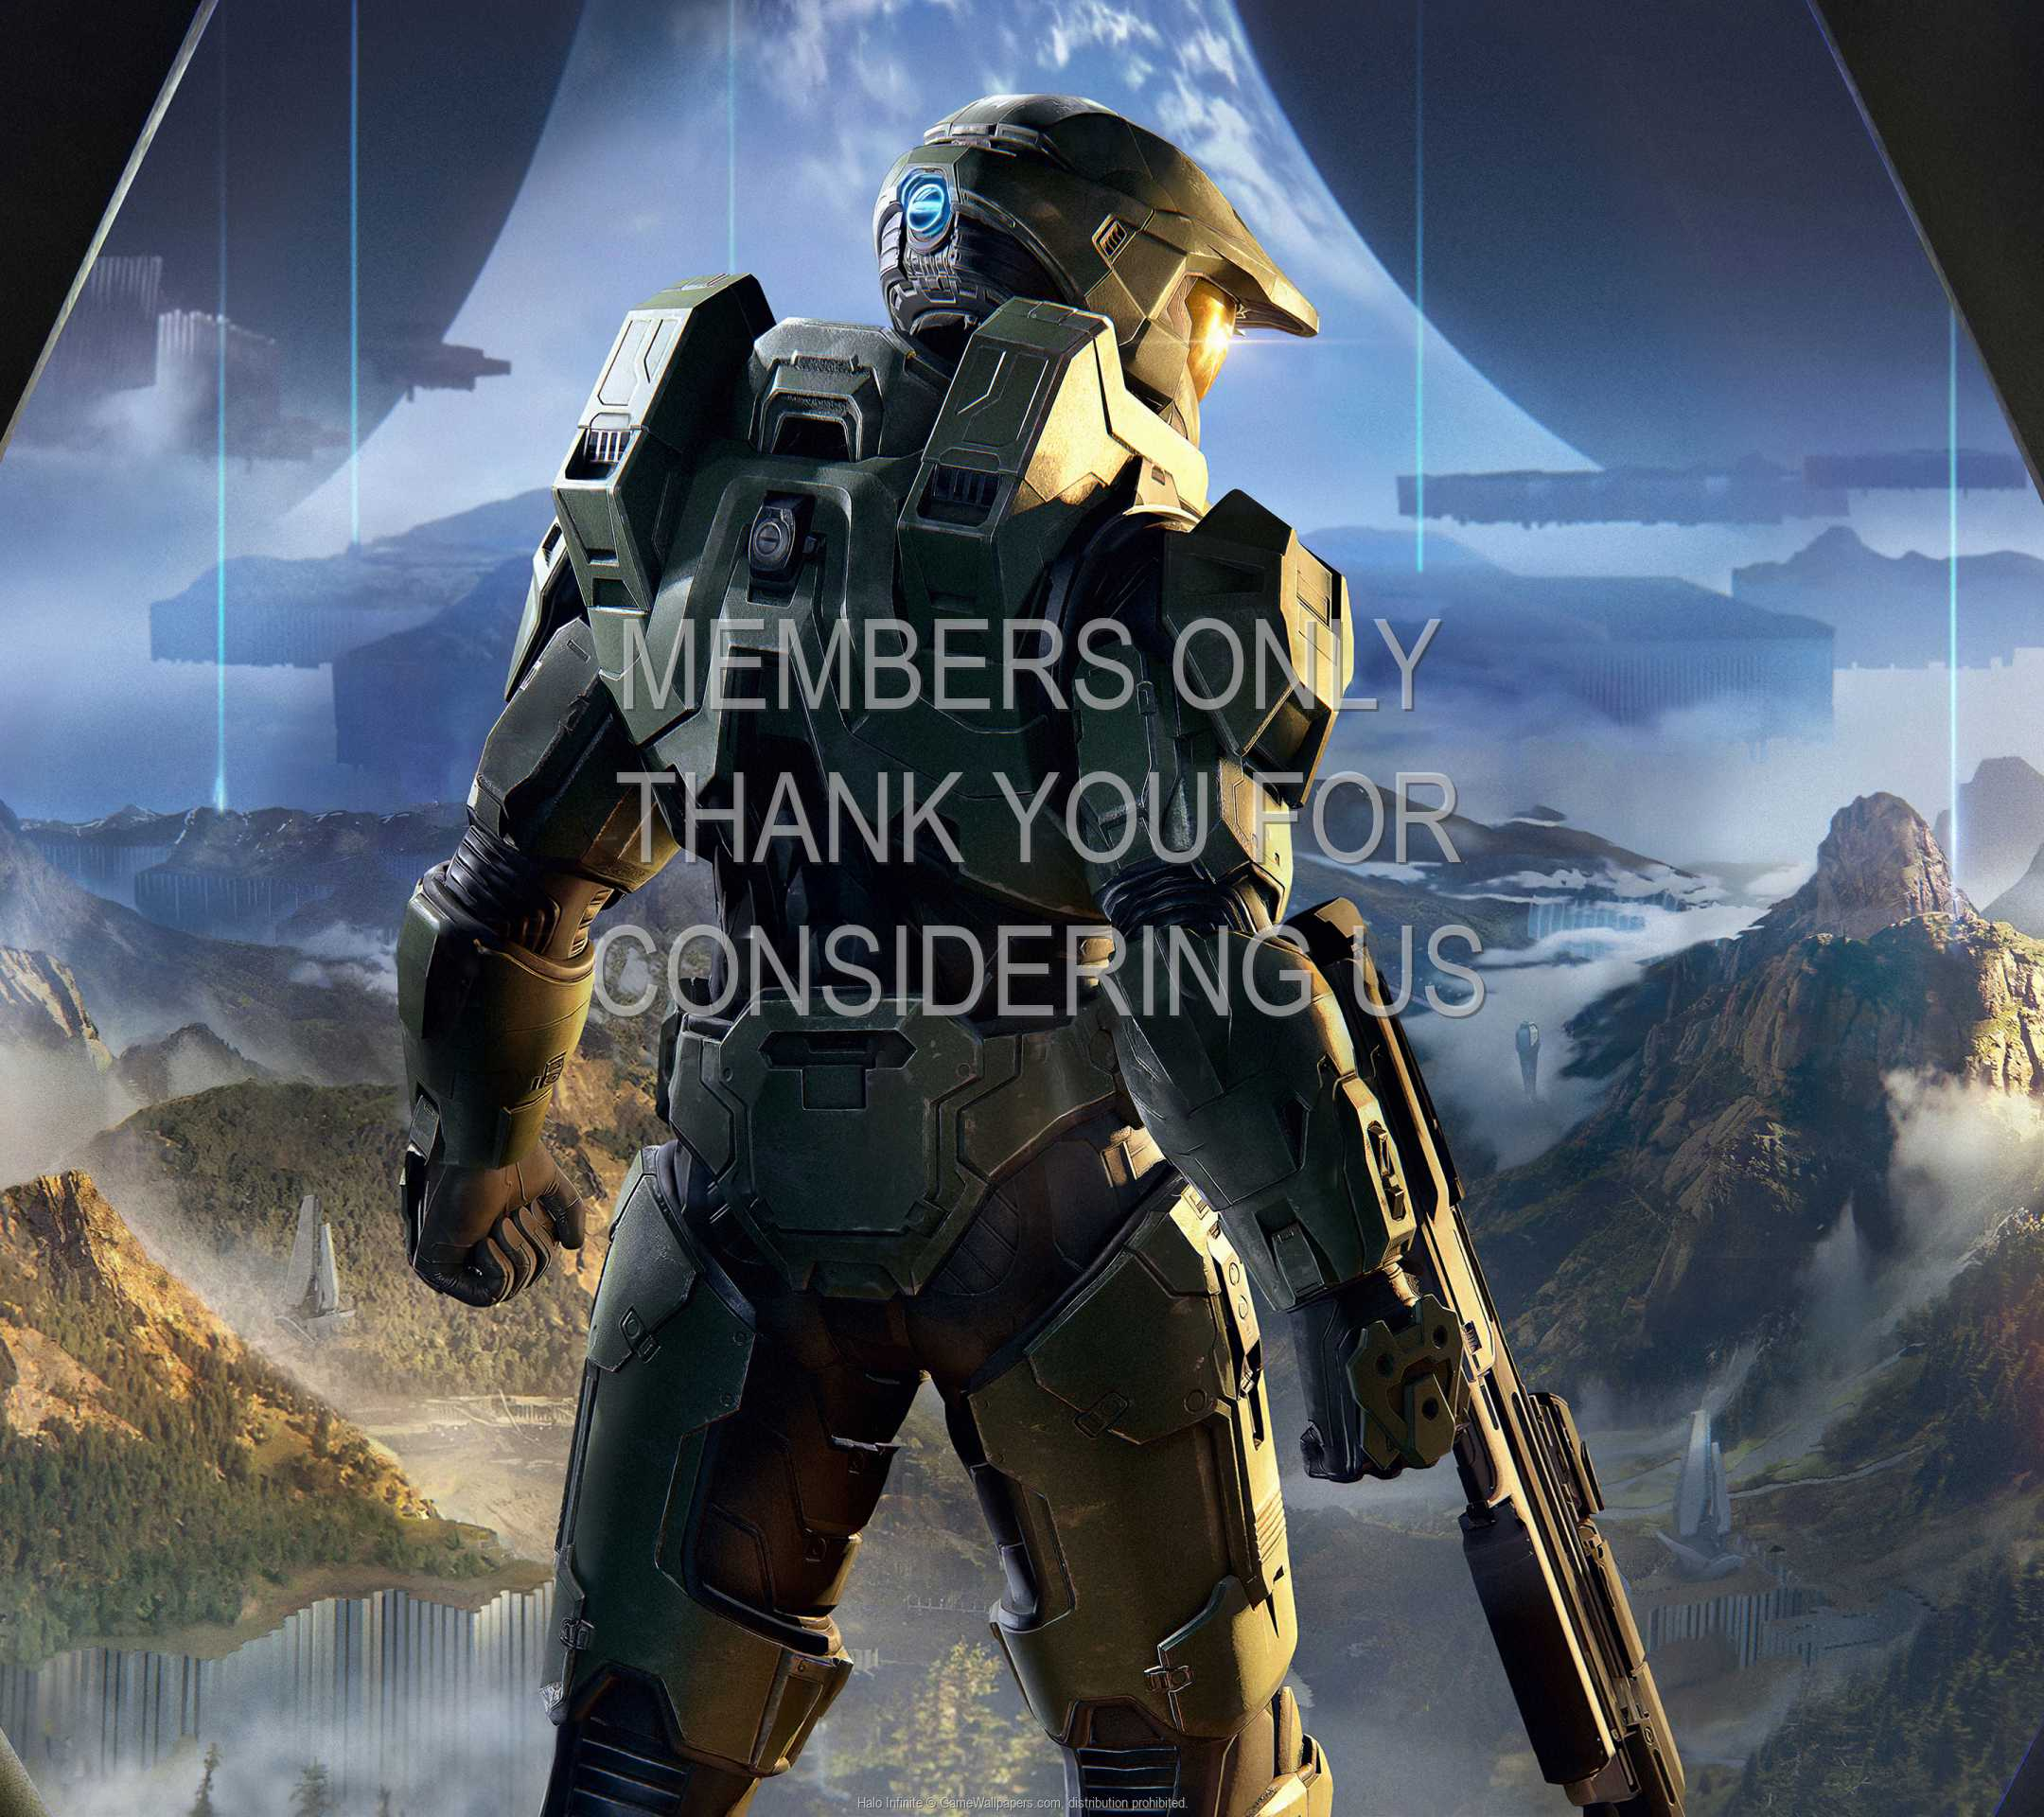 Halo: Infinite 1080p Horizontal Mobile wallpaper or background 02